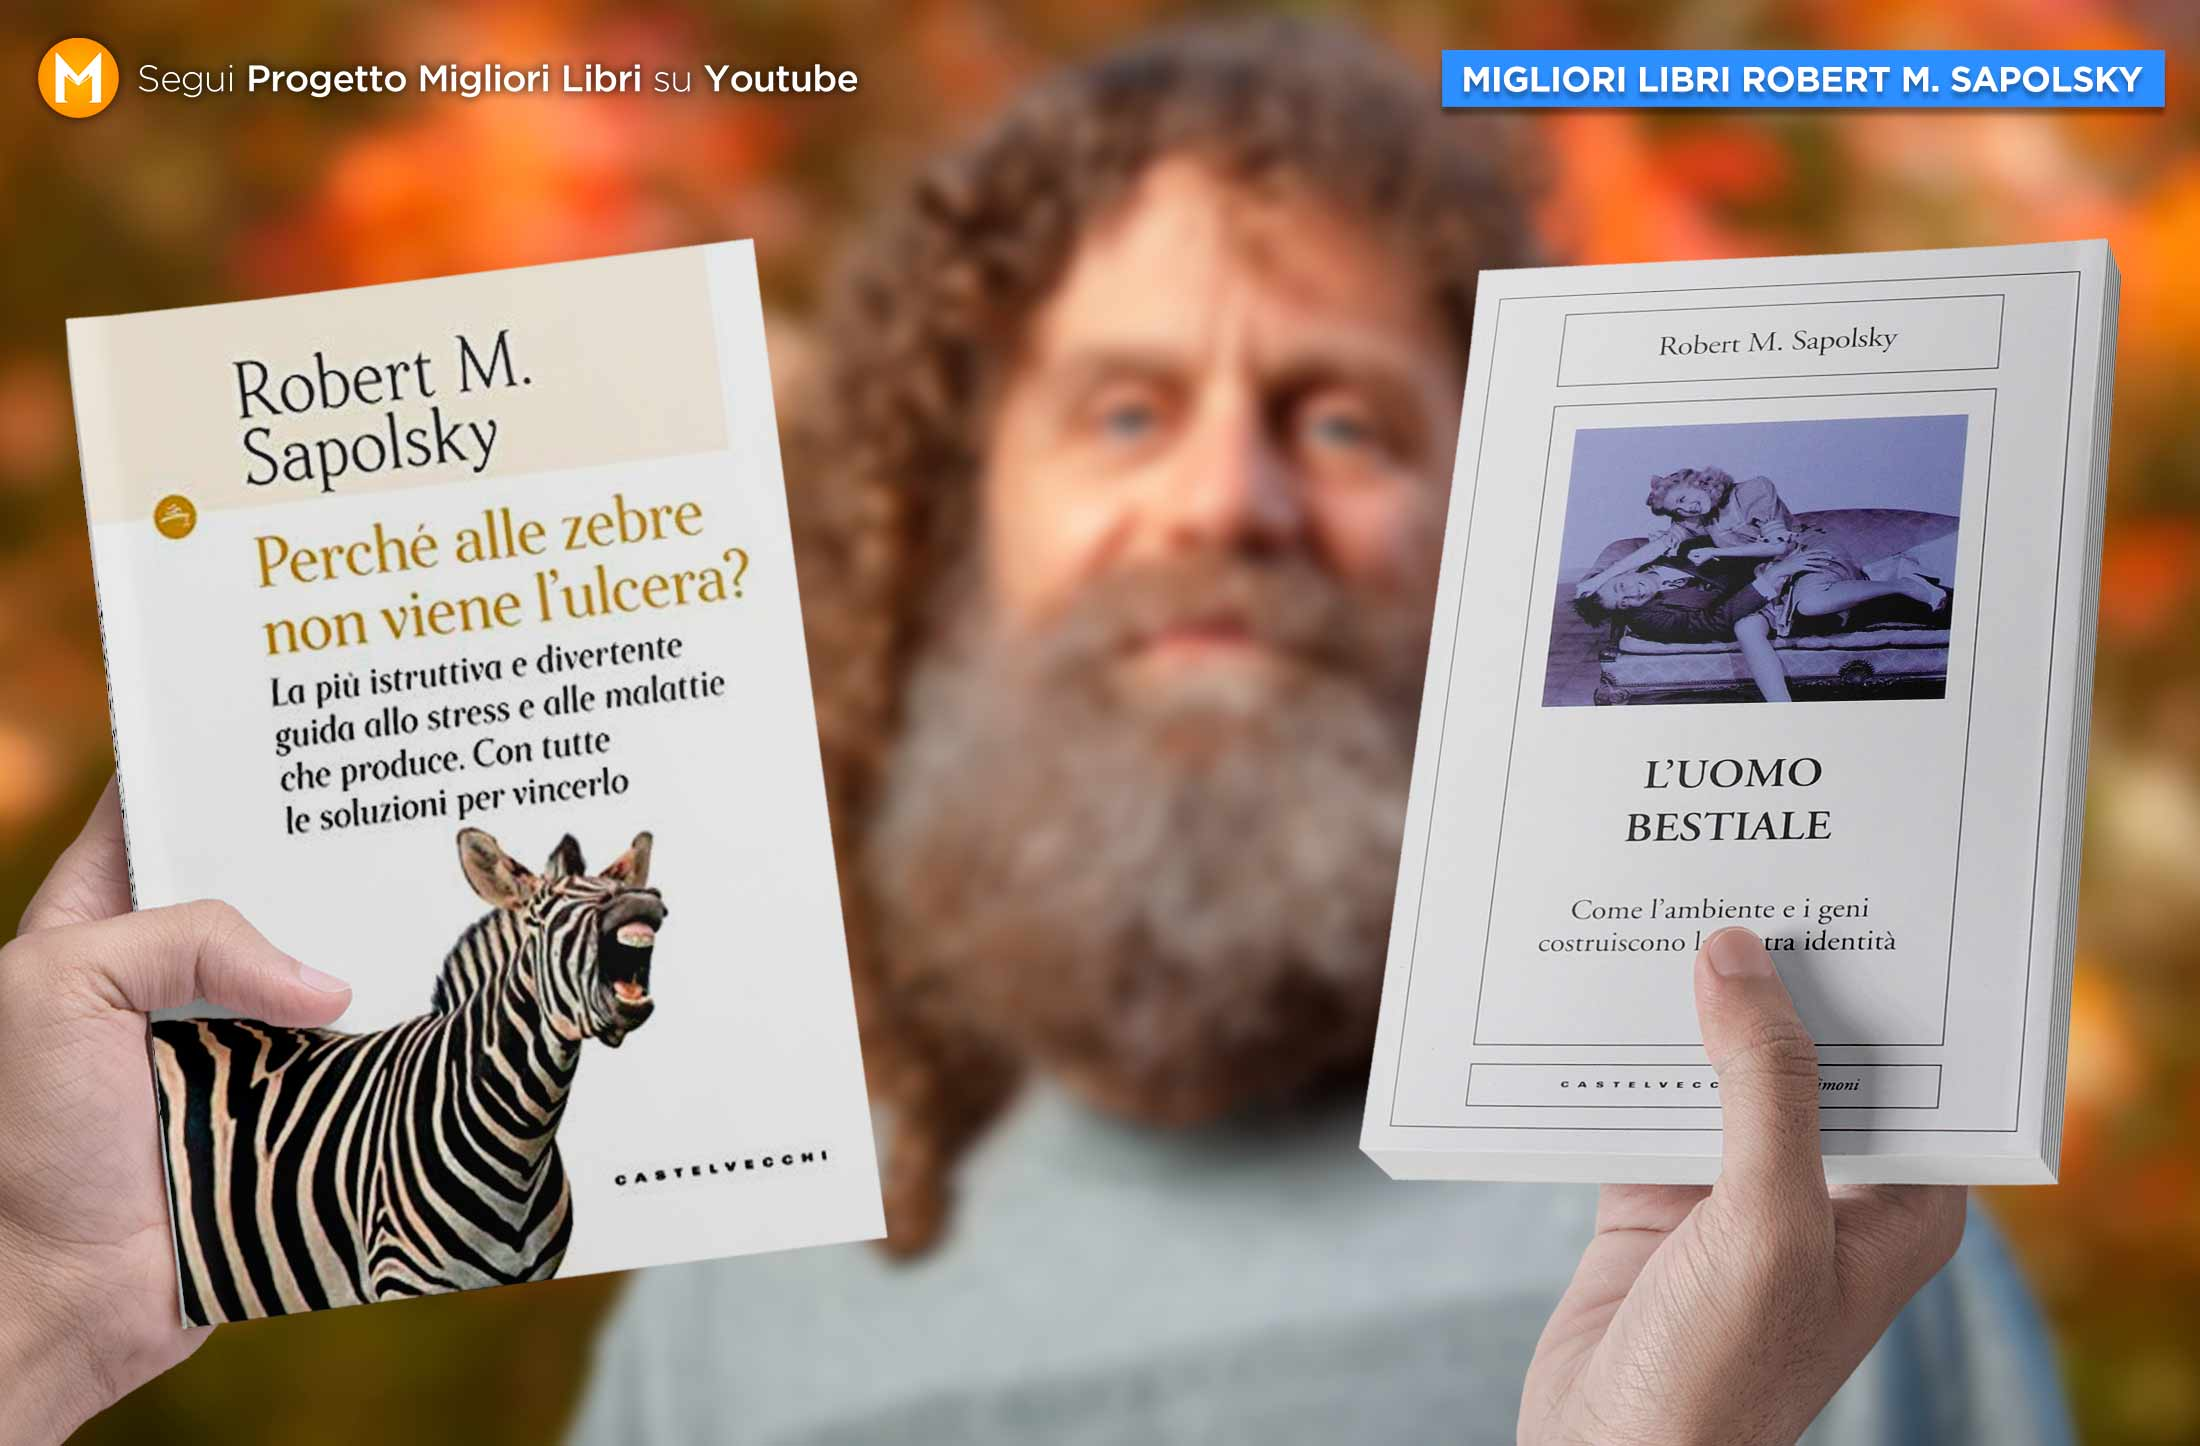 migliori-libri-robert-sapolsky